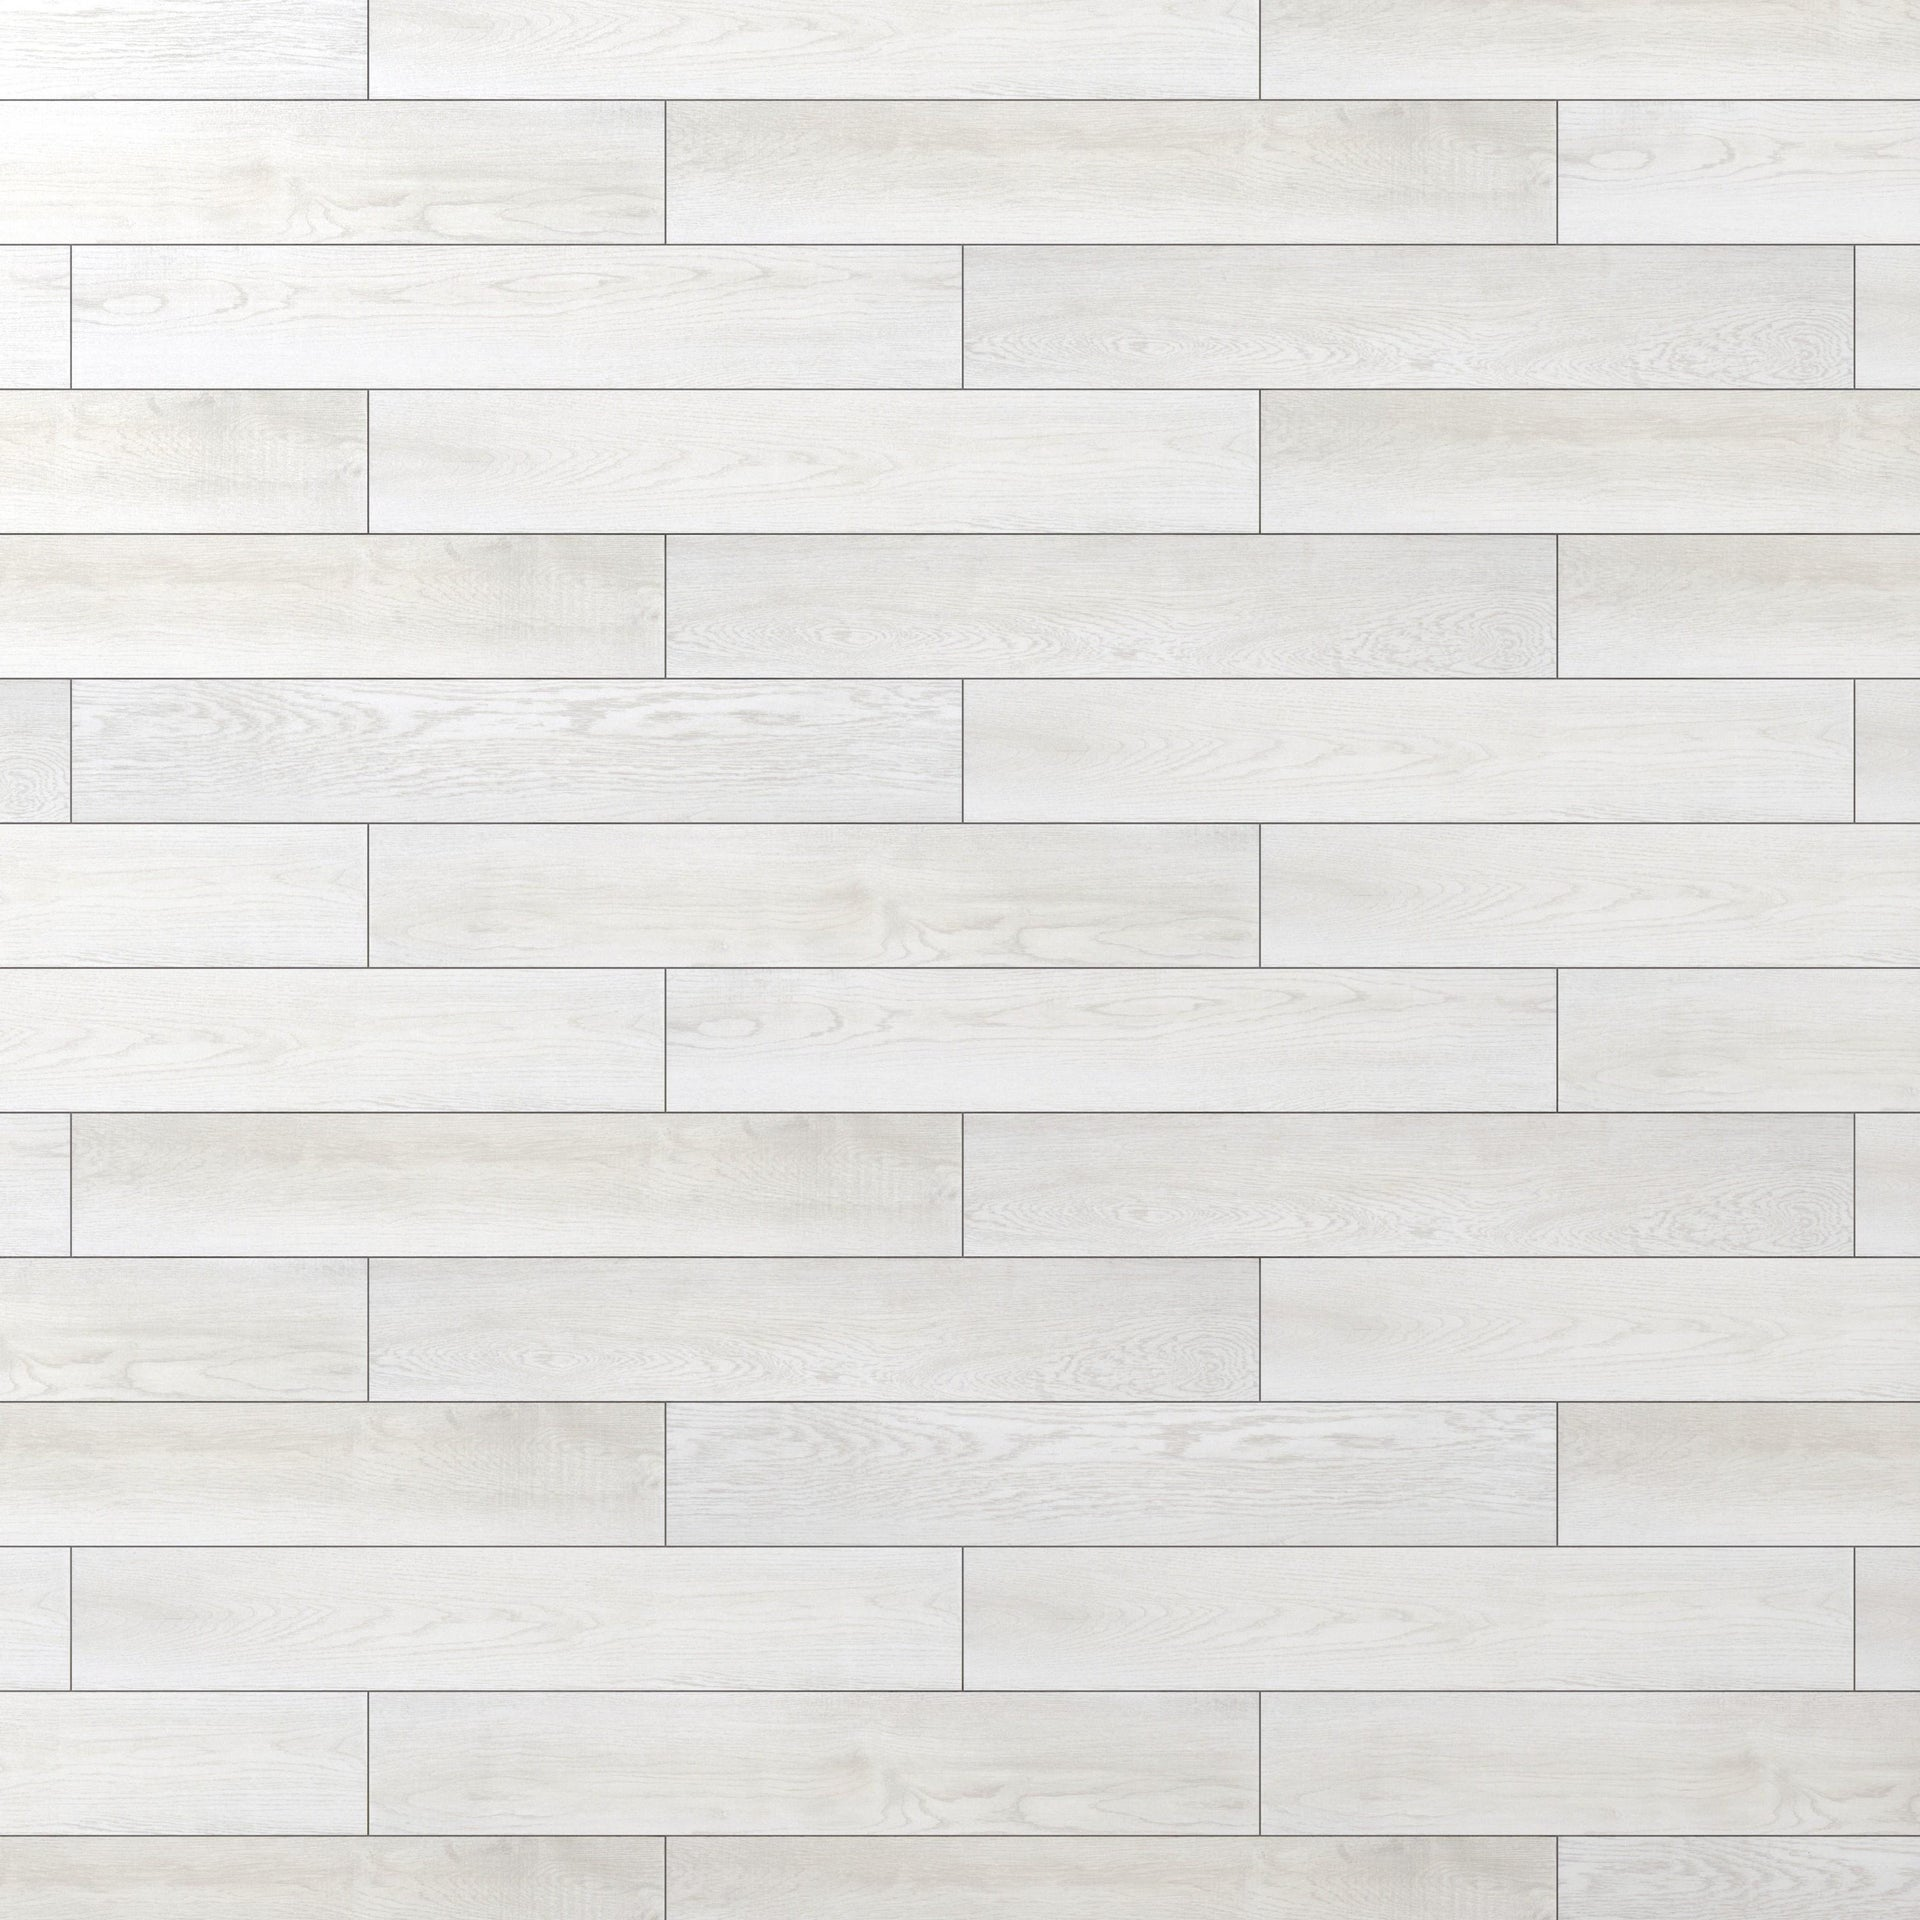 Pavimento PVC adesivo Rough Sp 2 mm bianco - 2